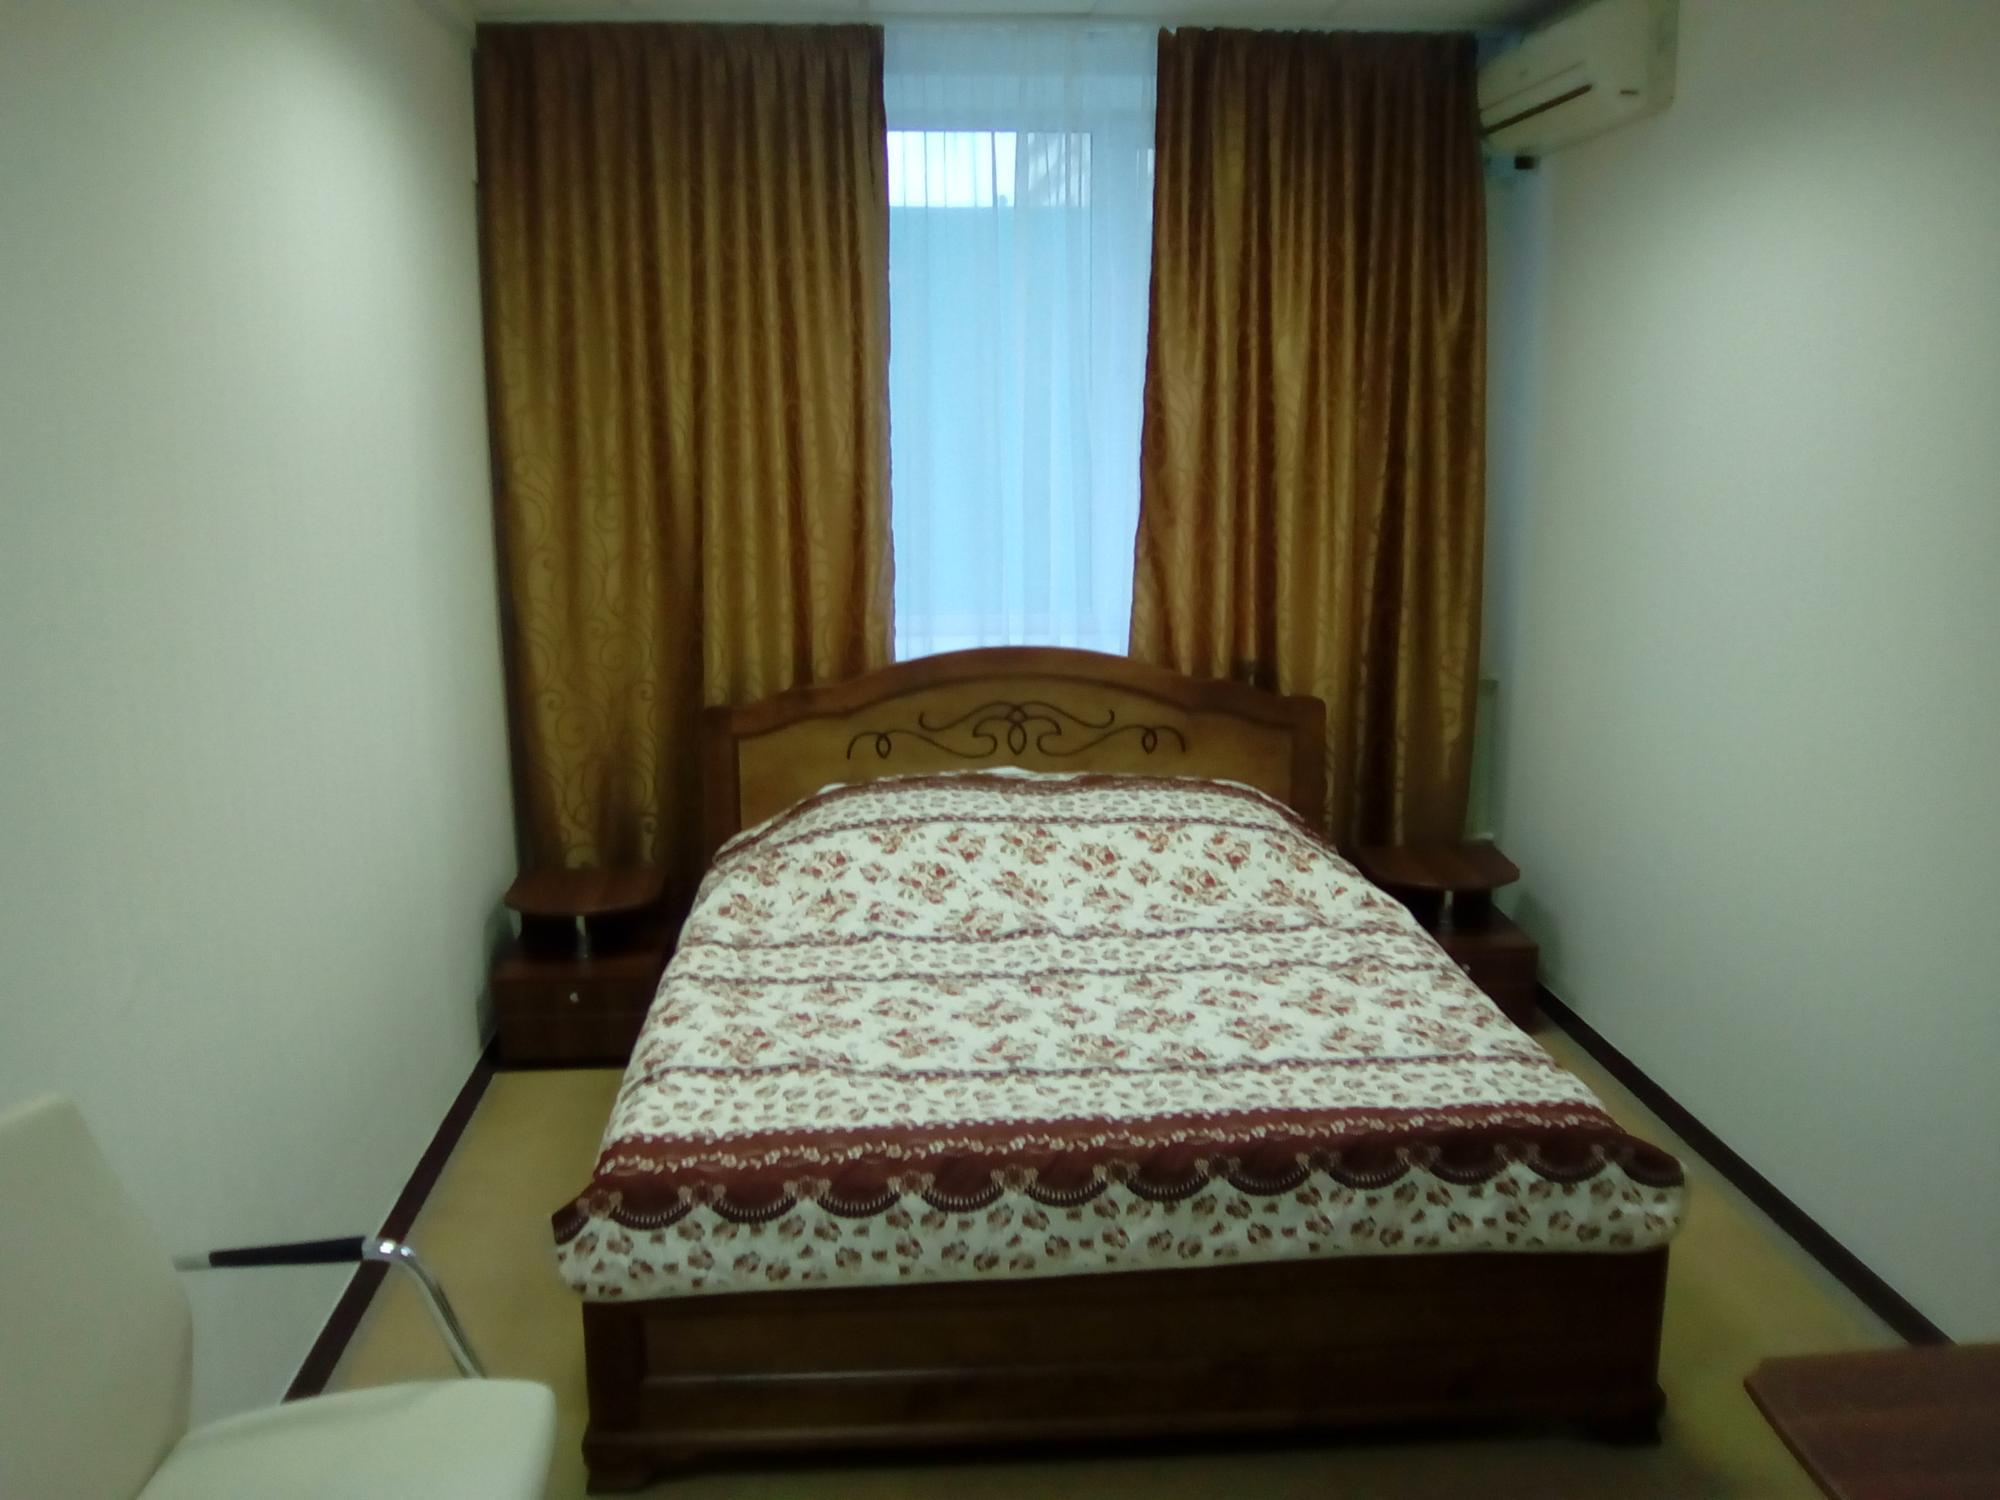 фотография Гостиницы АСКА на Бутырской улице, 76 стр 4